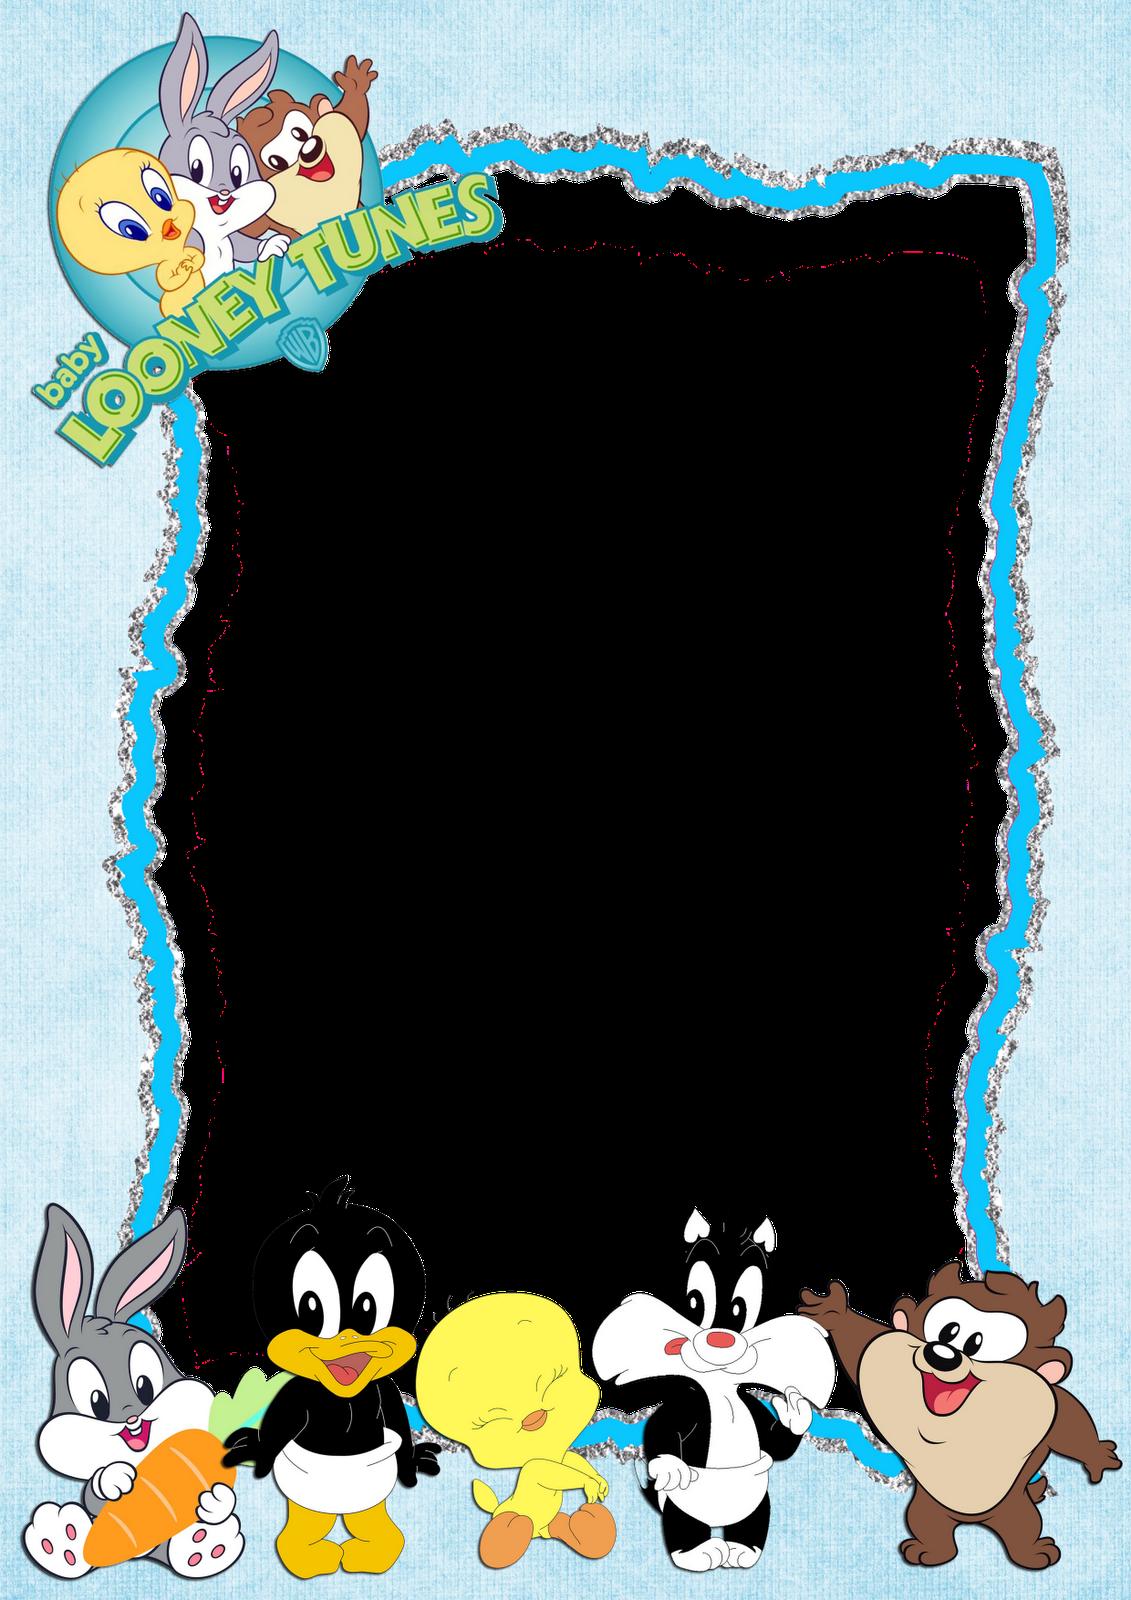 Baby looney tunes wallpaper border - photo#39